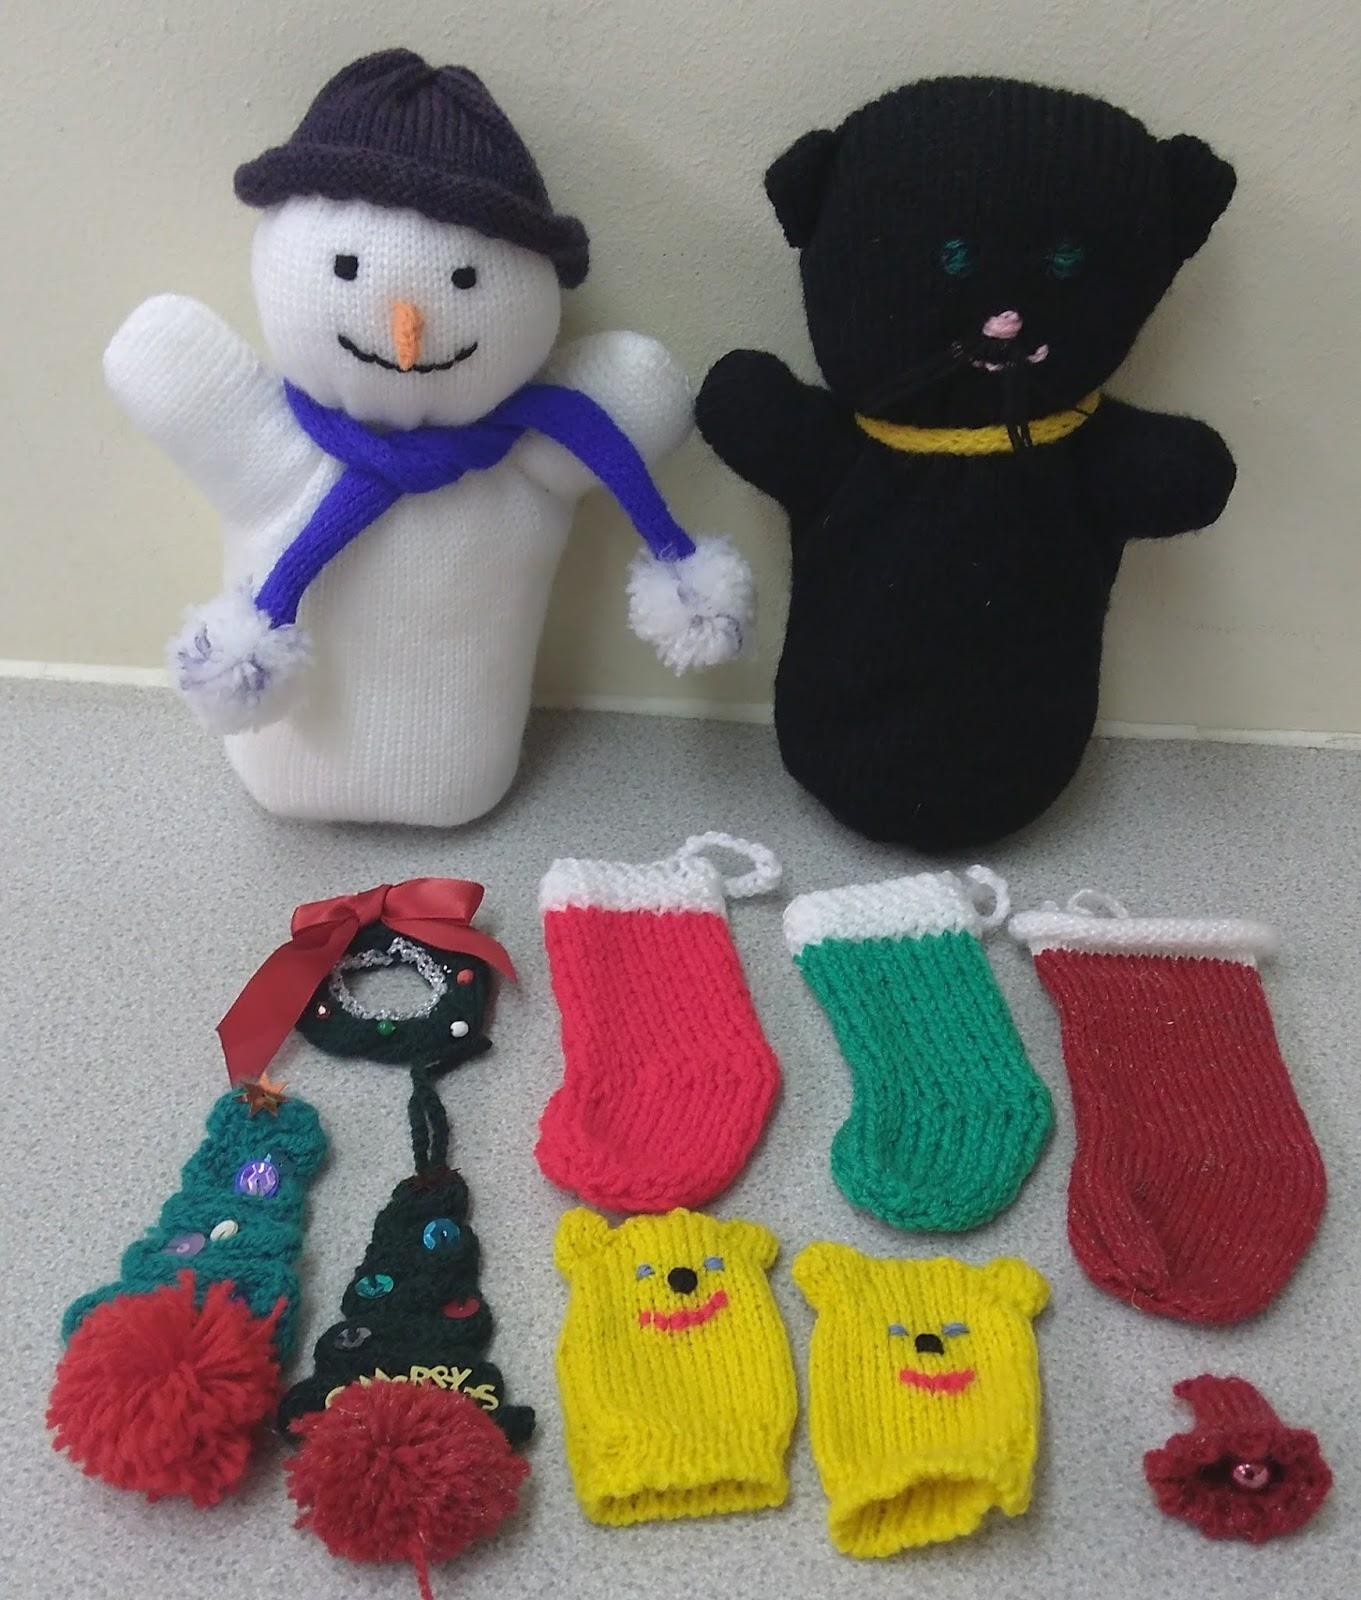 Fleet Knitting Club: November 2017 - Christmas Knits